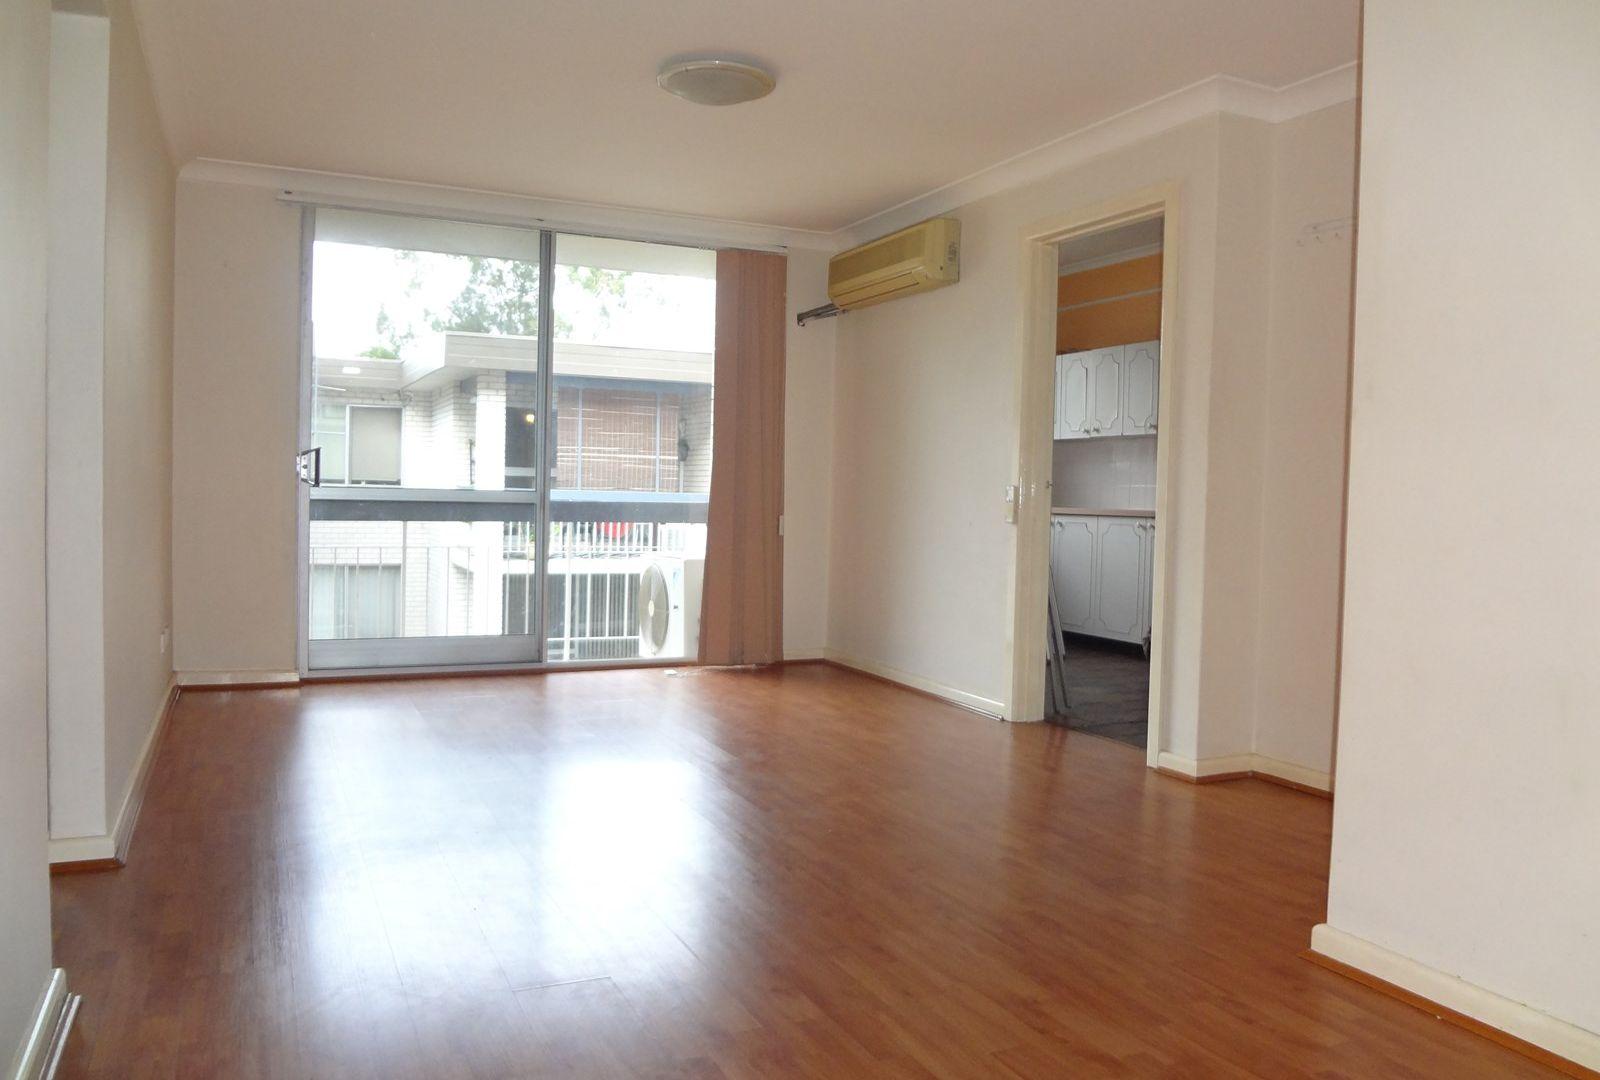 7/2-6 Albert Street, North Parramatta NSW 2151, Image 1